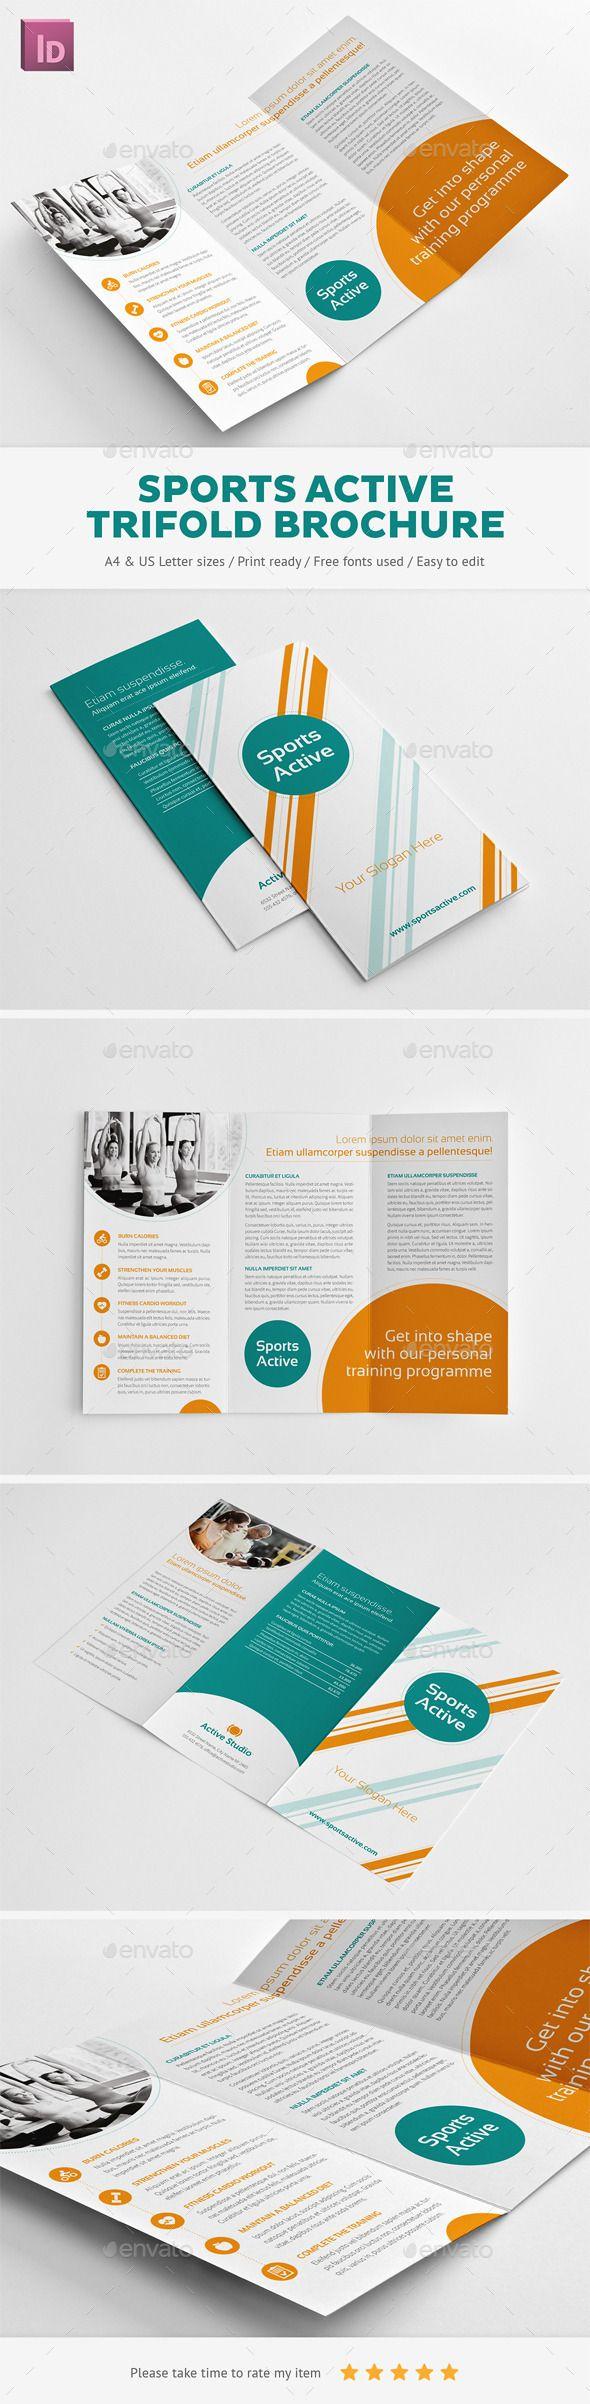 Sports Active Trifold Brochure - Corporate Brochures  http://graphicriver.net/item/sports-active-trifold-brochure/9944636?WT.ac=portfolio&WT.z_author=Snowboy